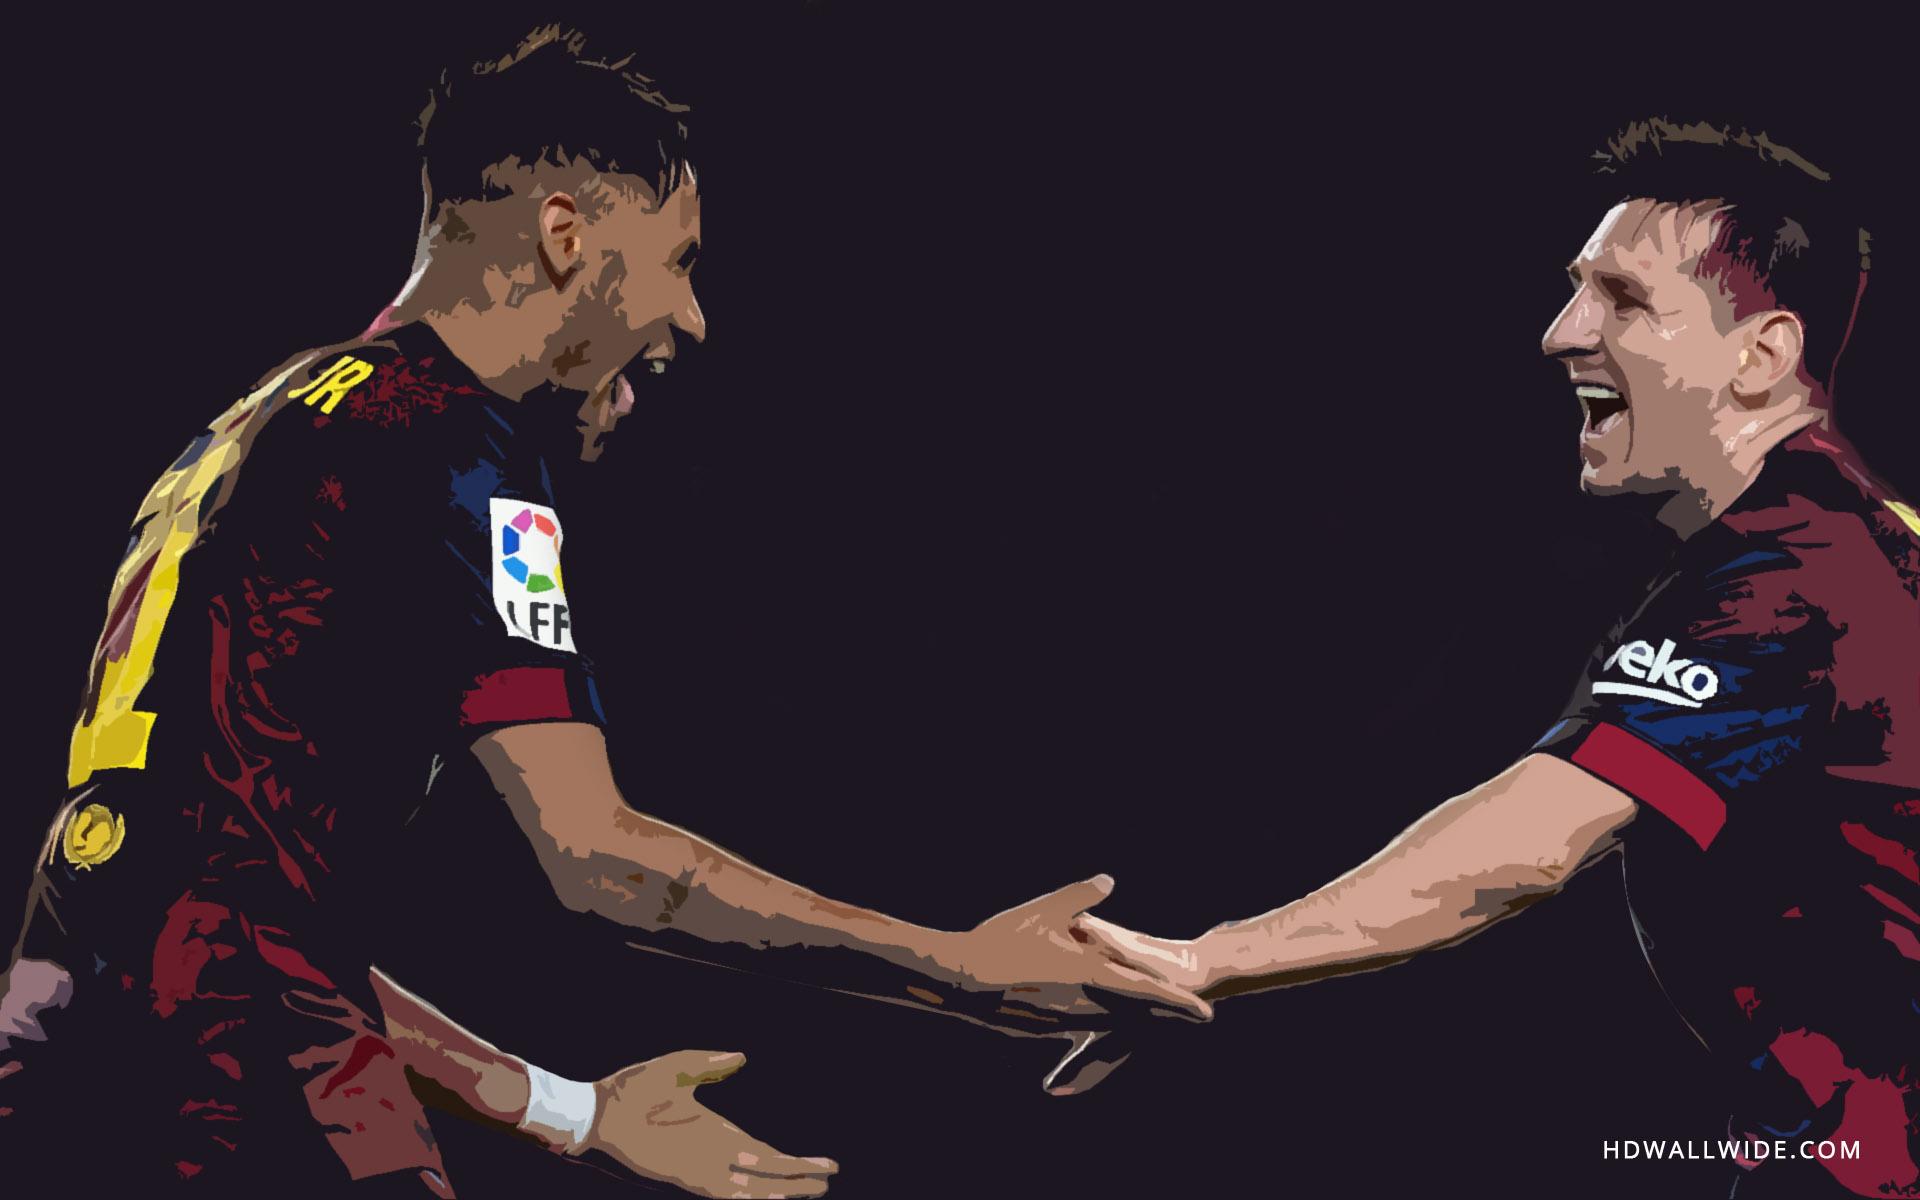 Free Download Wallpaper Neymar Messi Goal Celebrations Wallpaper